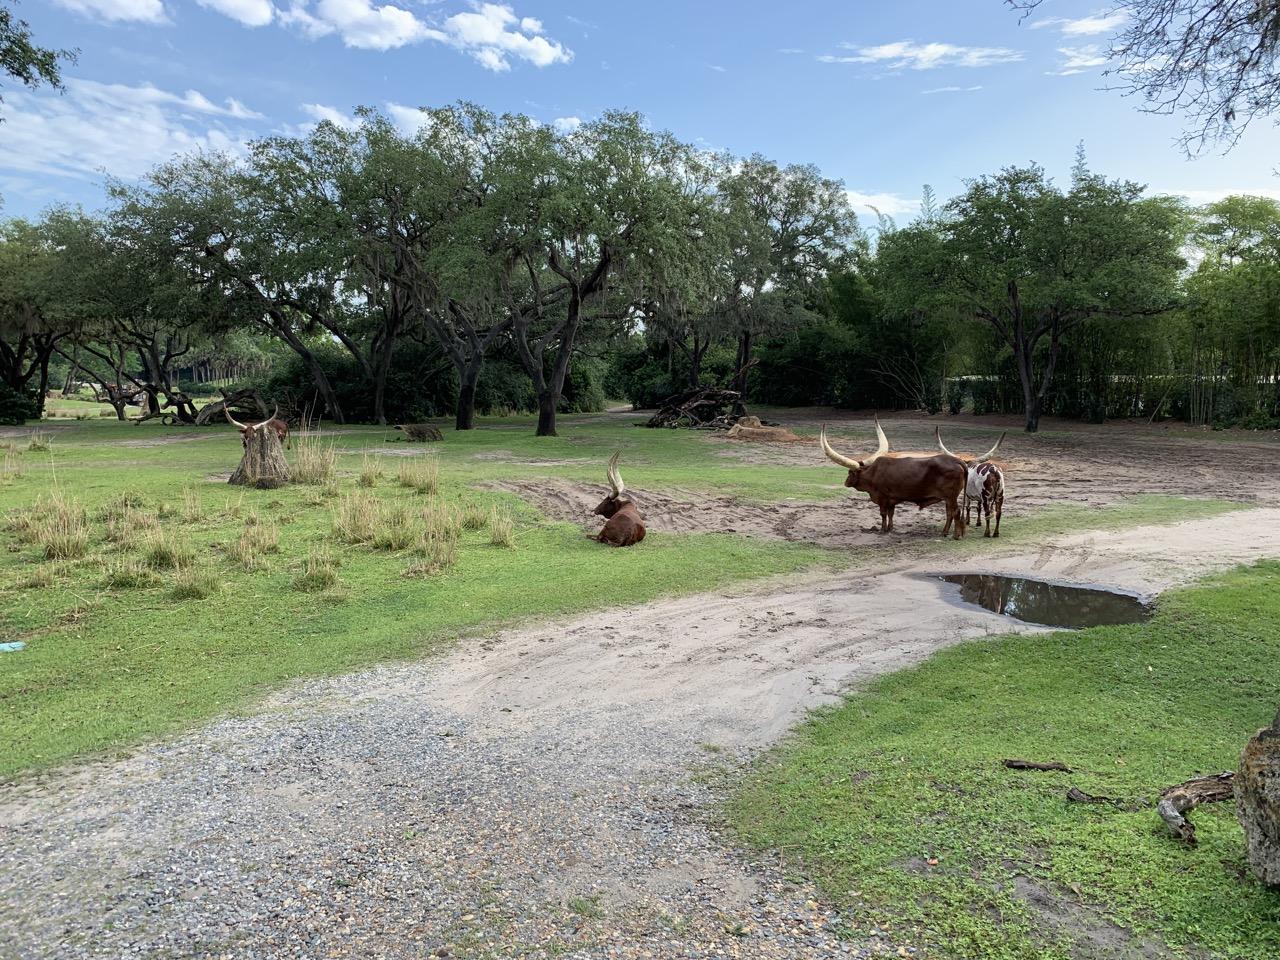 disney world trip report early summer 2019 day three 34 safari.jpeg